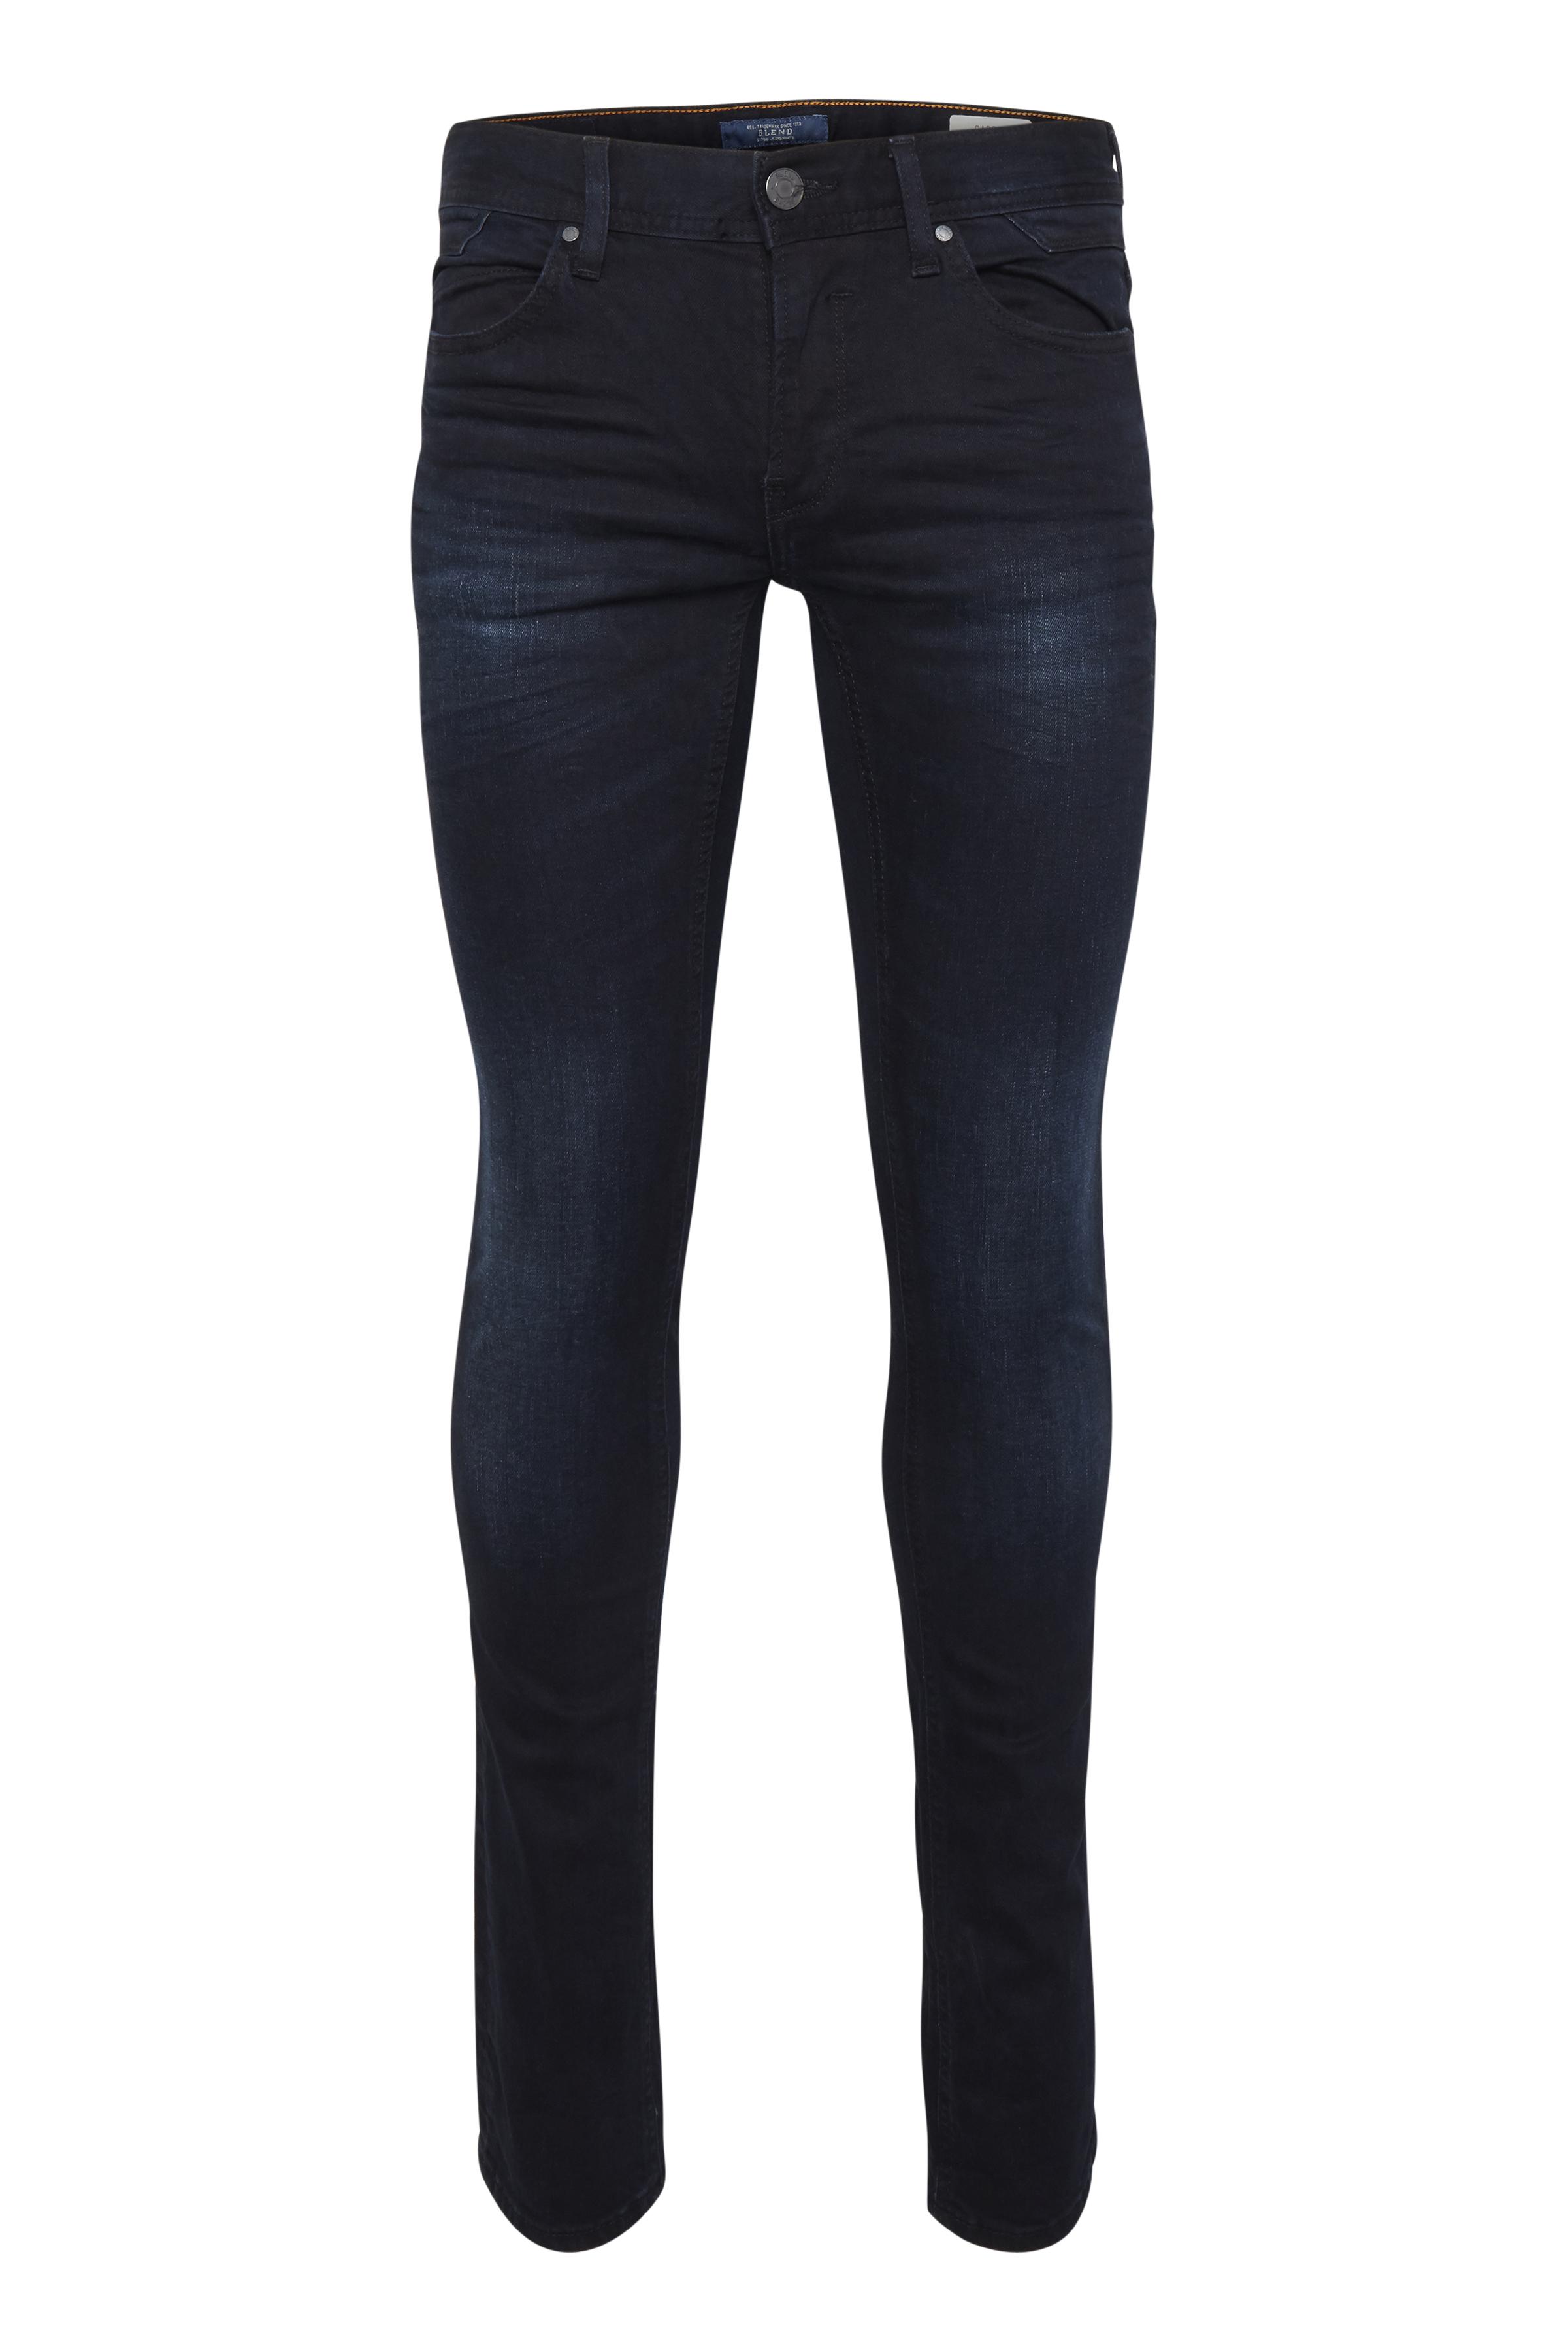 Image of Blend He Herre Jeans - Sort